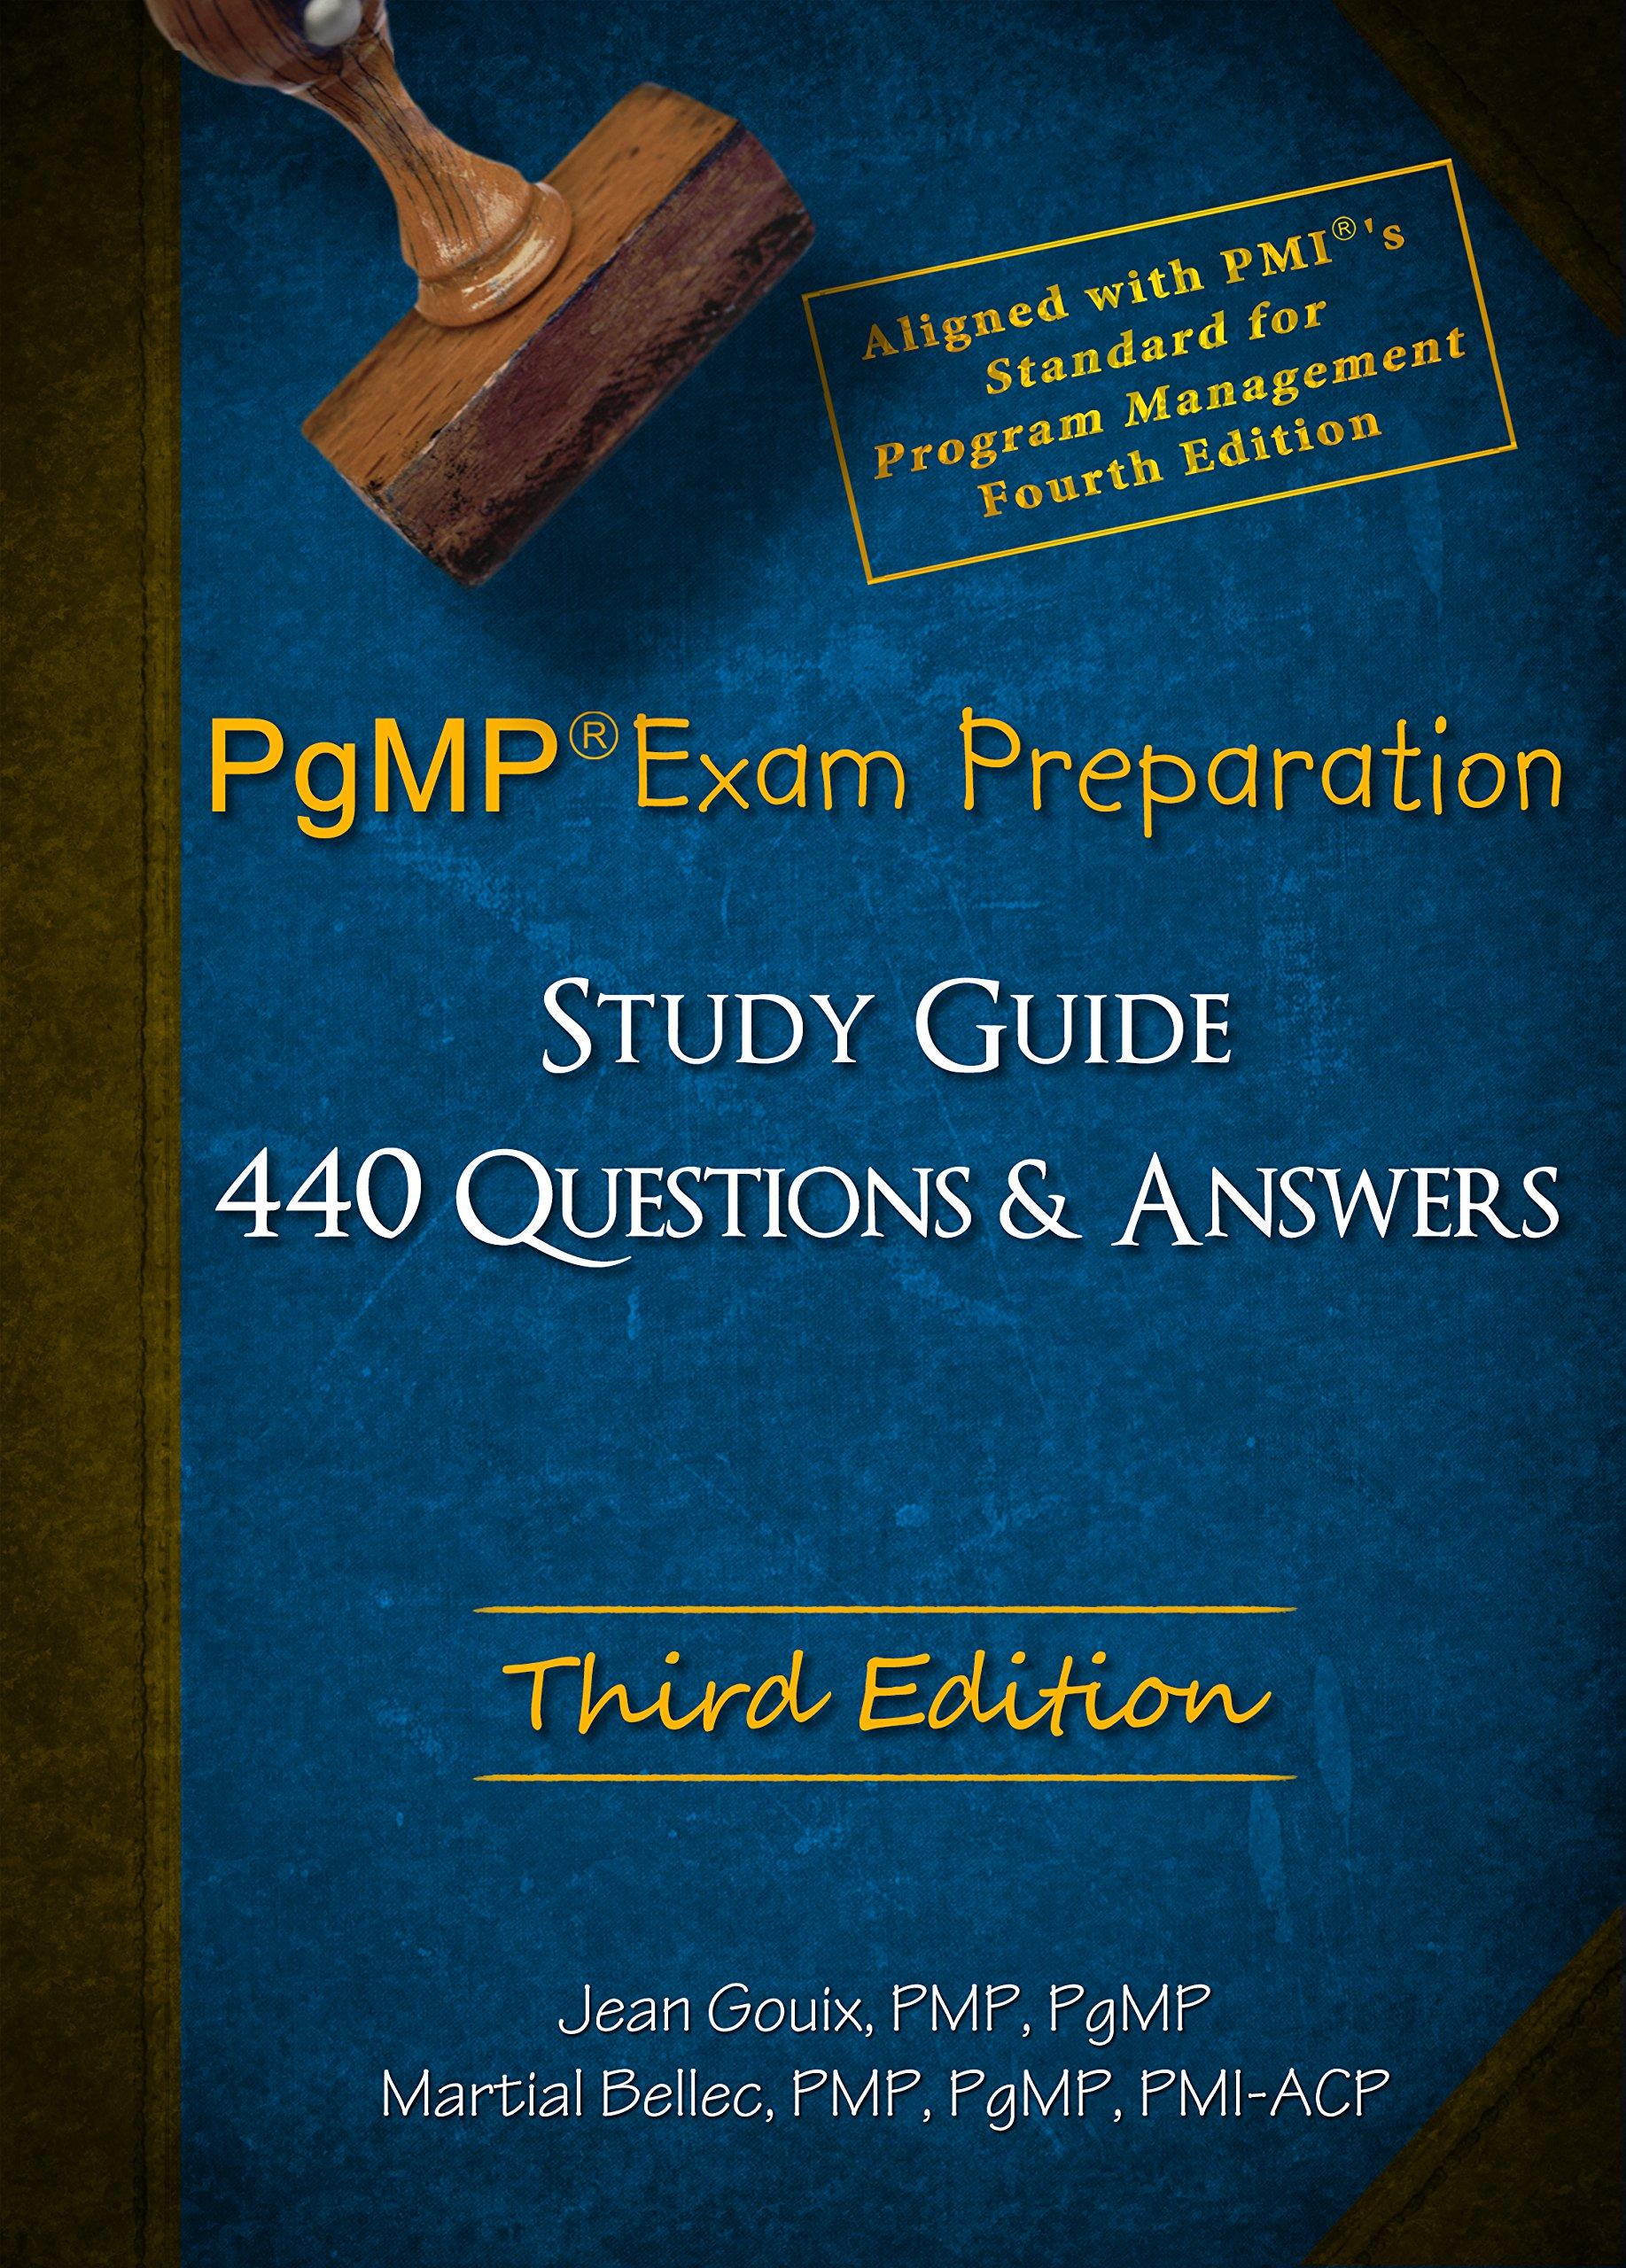 PgMP Exam Preparation and Study Guide - Third Edition: Jean Gouix and  Martial Bellec: 9782954607818: Amazon.com: Books